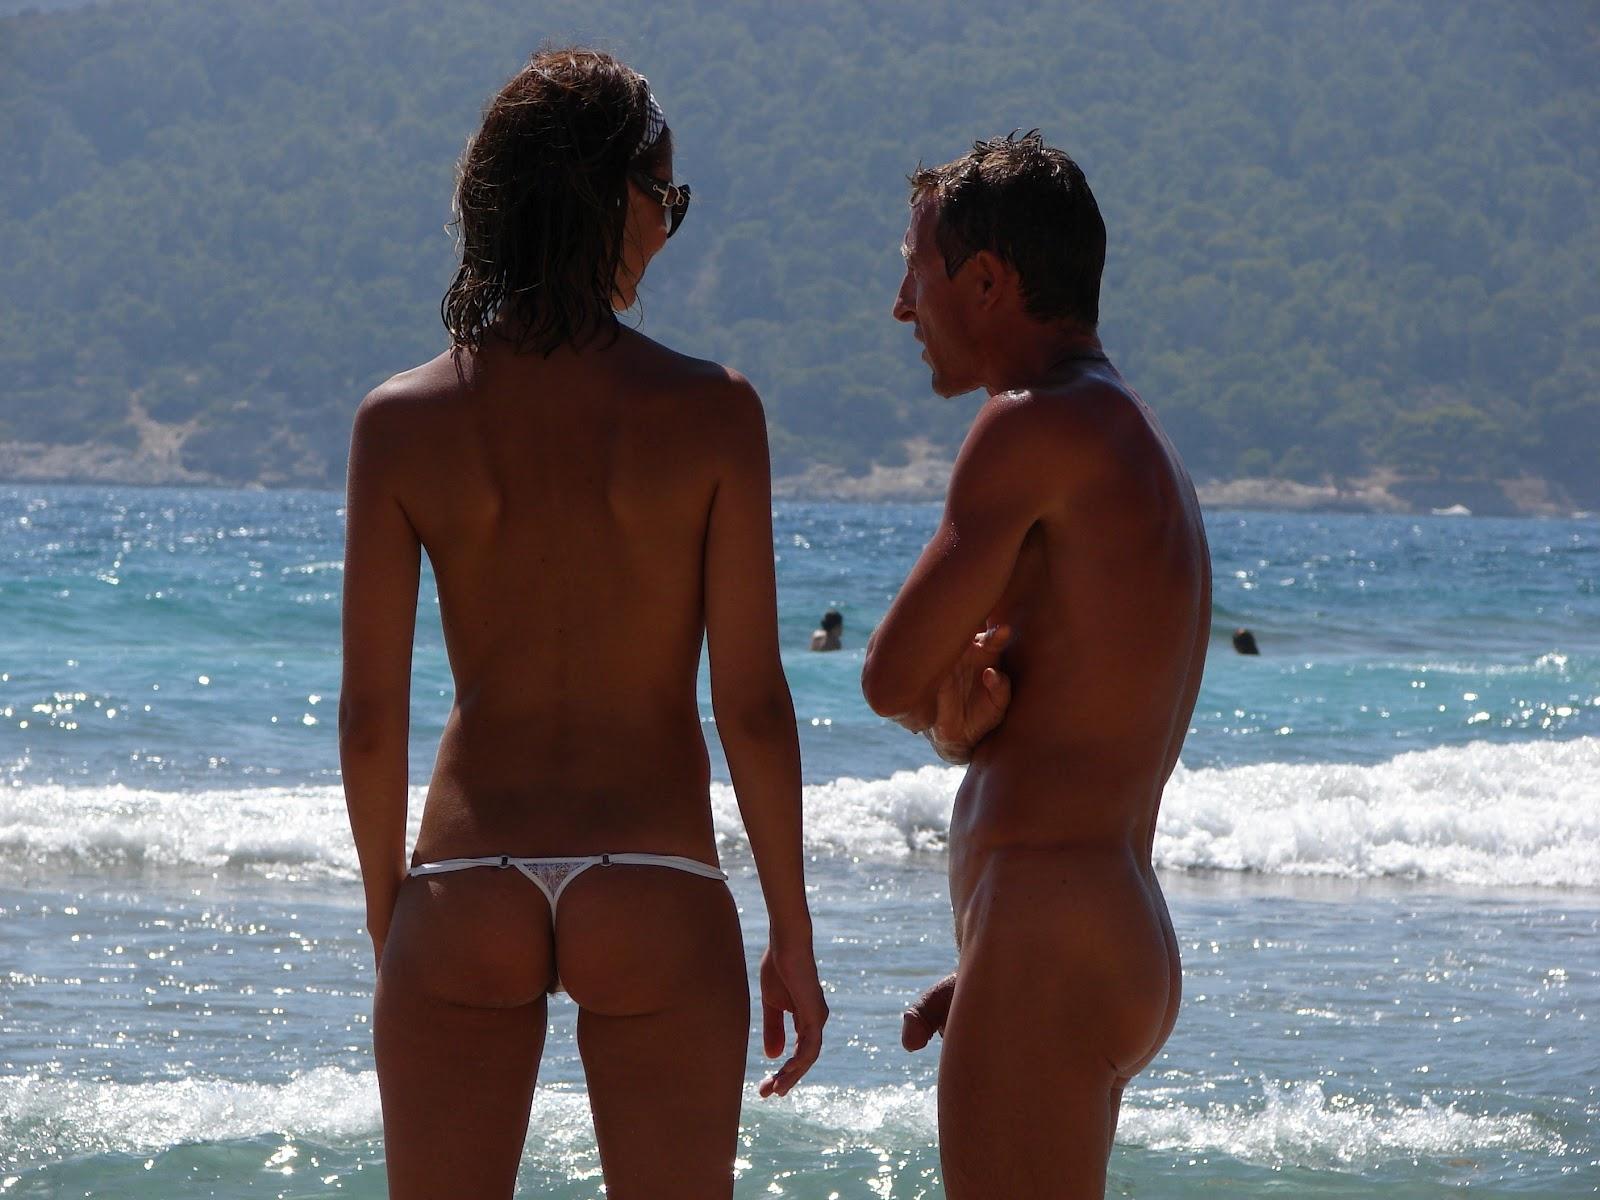 Great nude beach